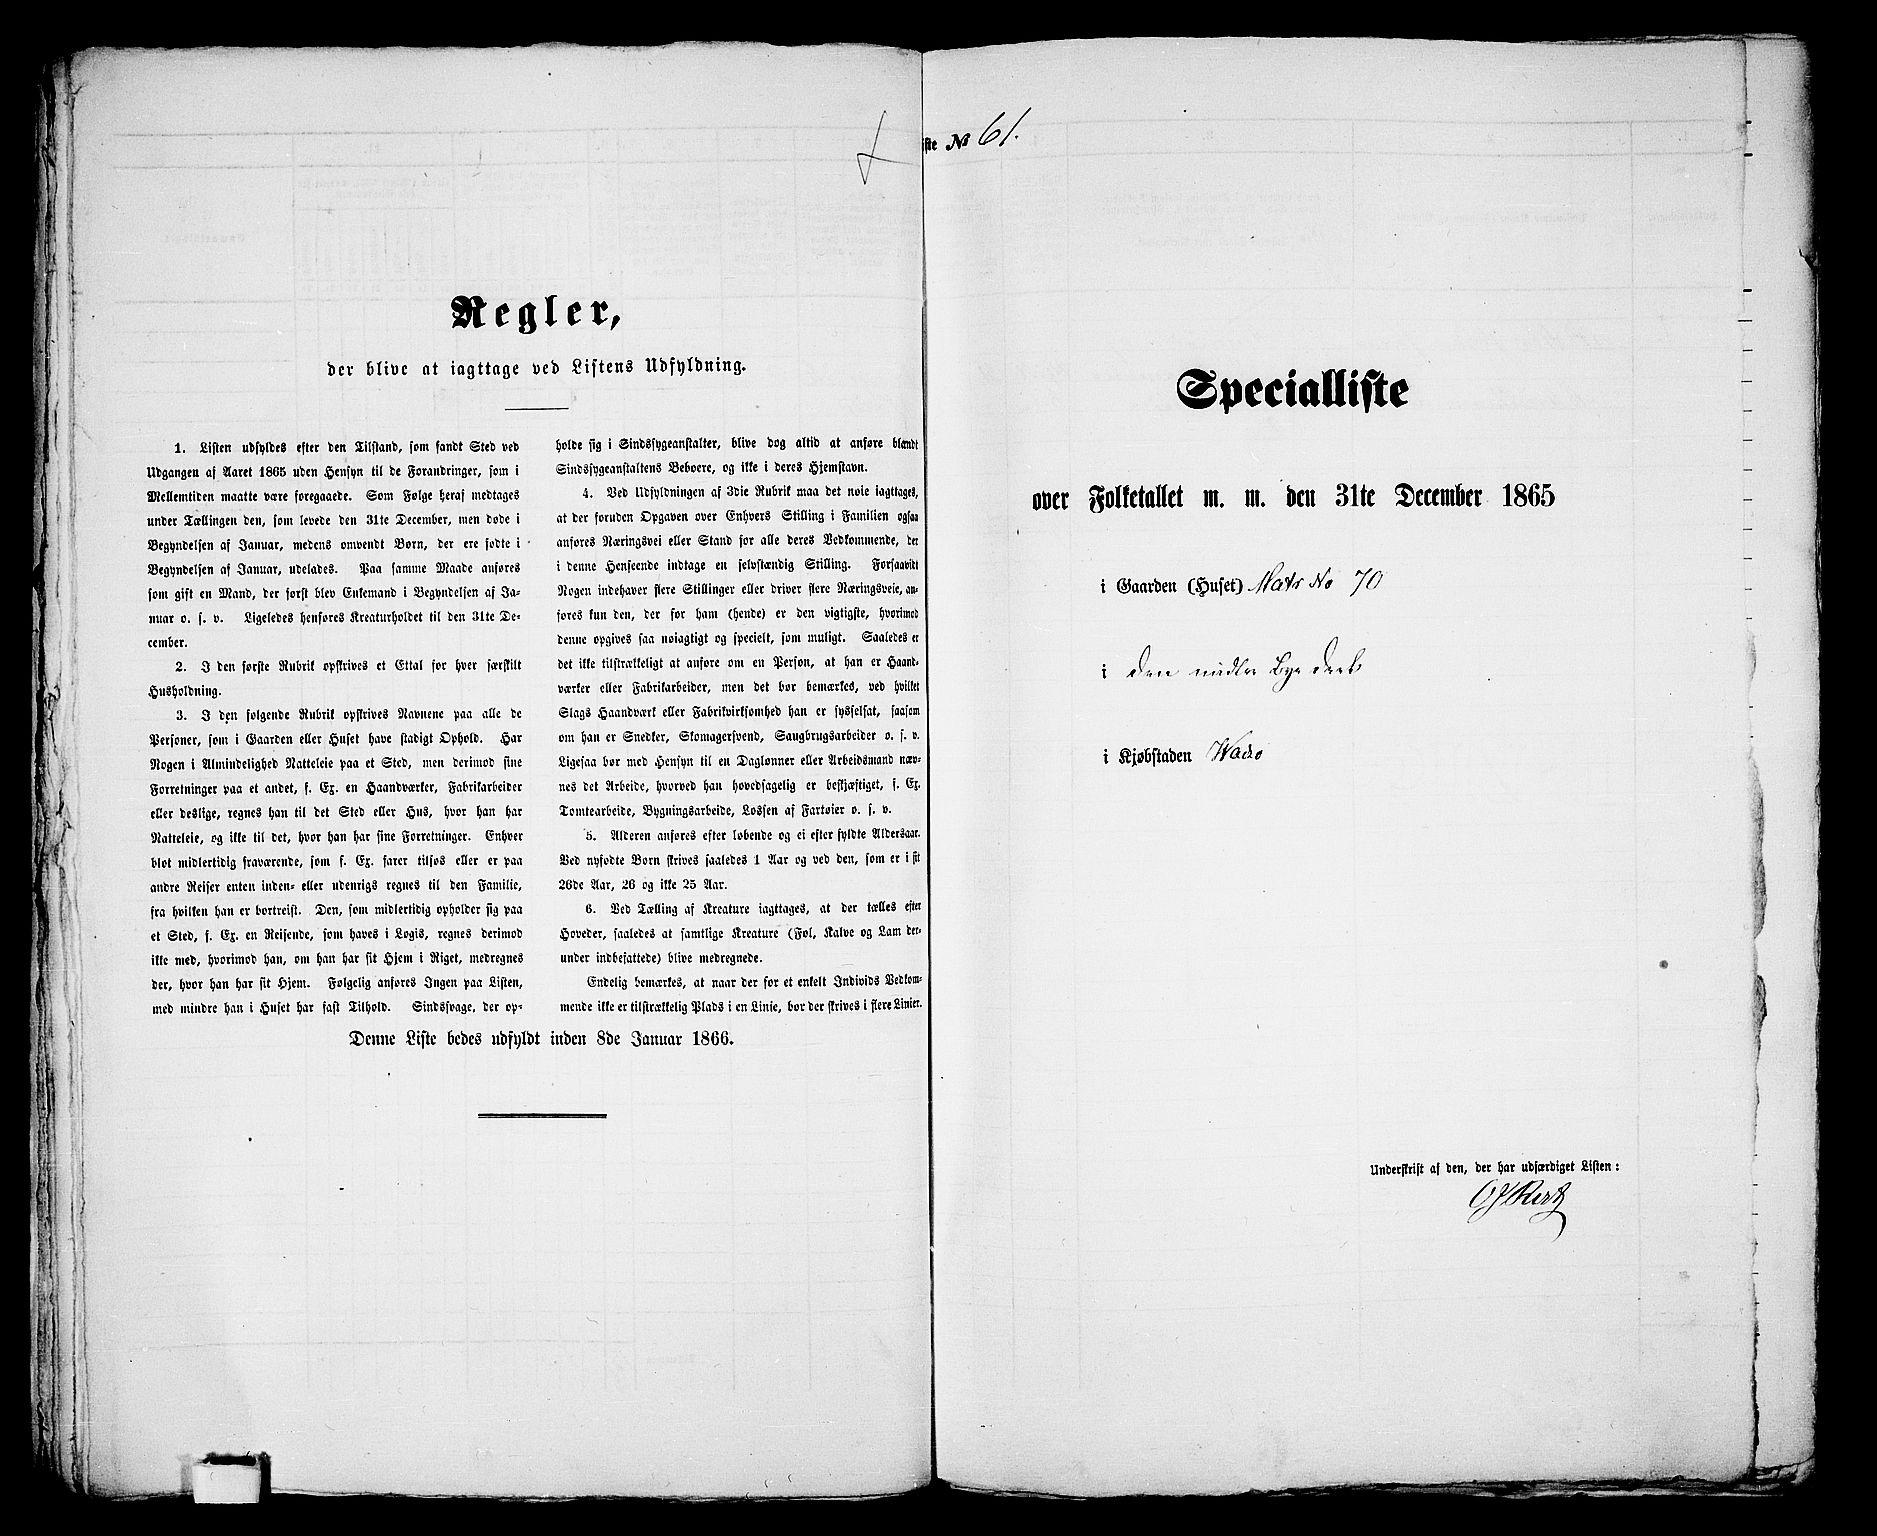 RA, Folketelling 1865 for 2003B Vadsø prestegjeld, Vadsø kjøpstad, 1865, s. 127